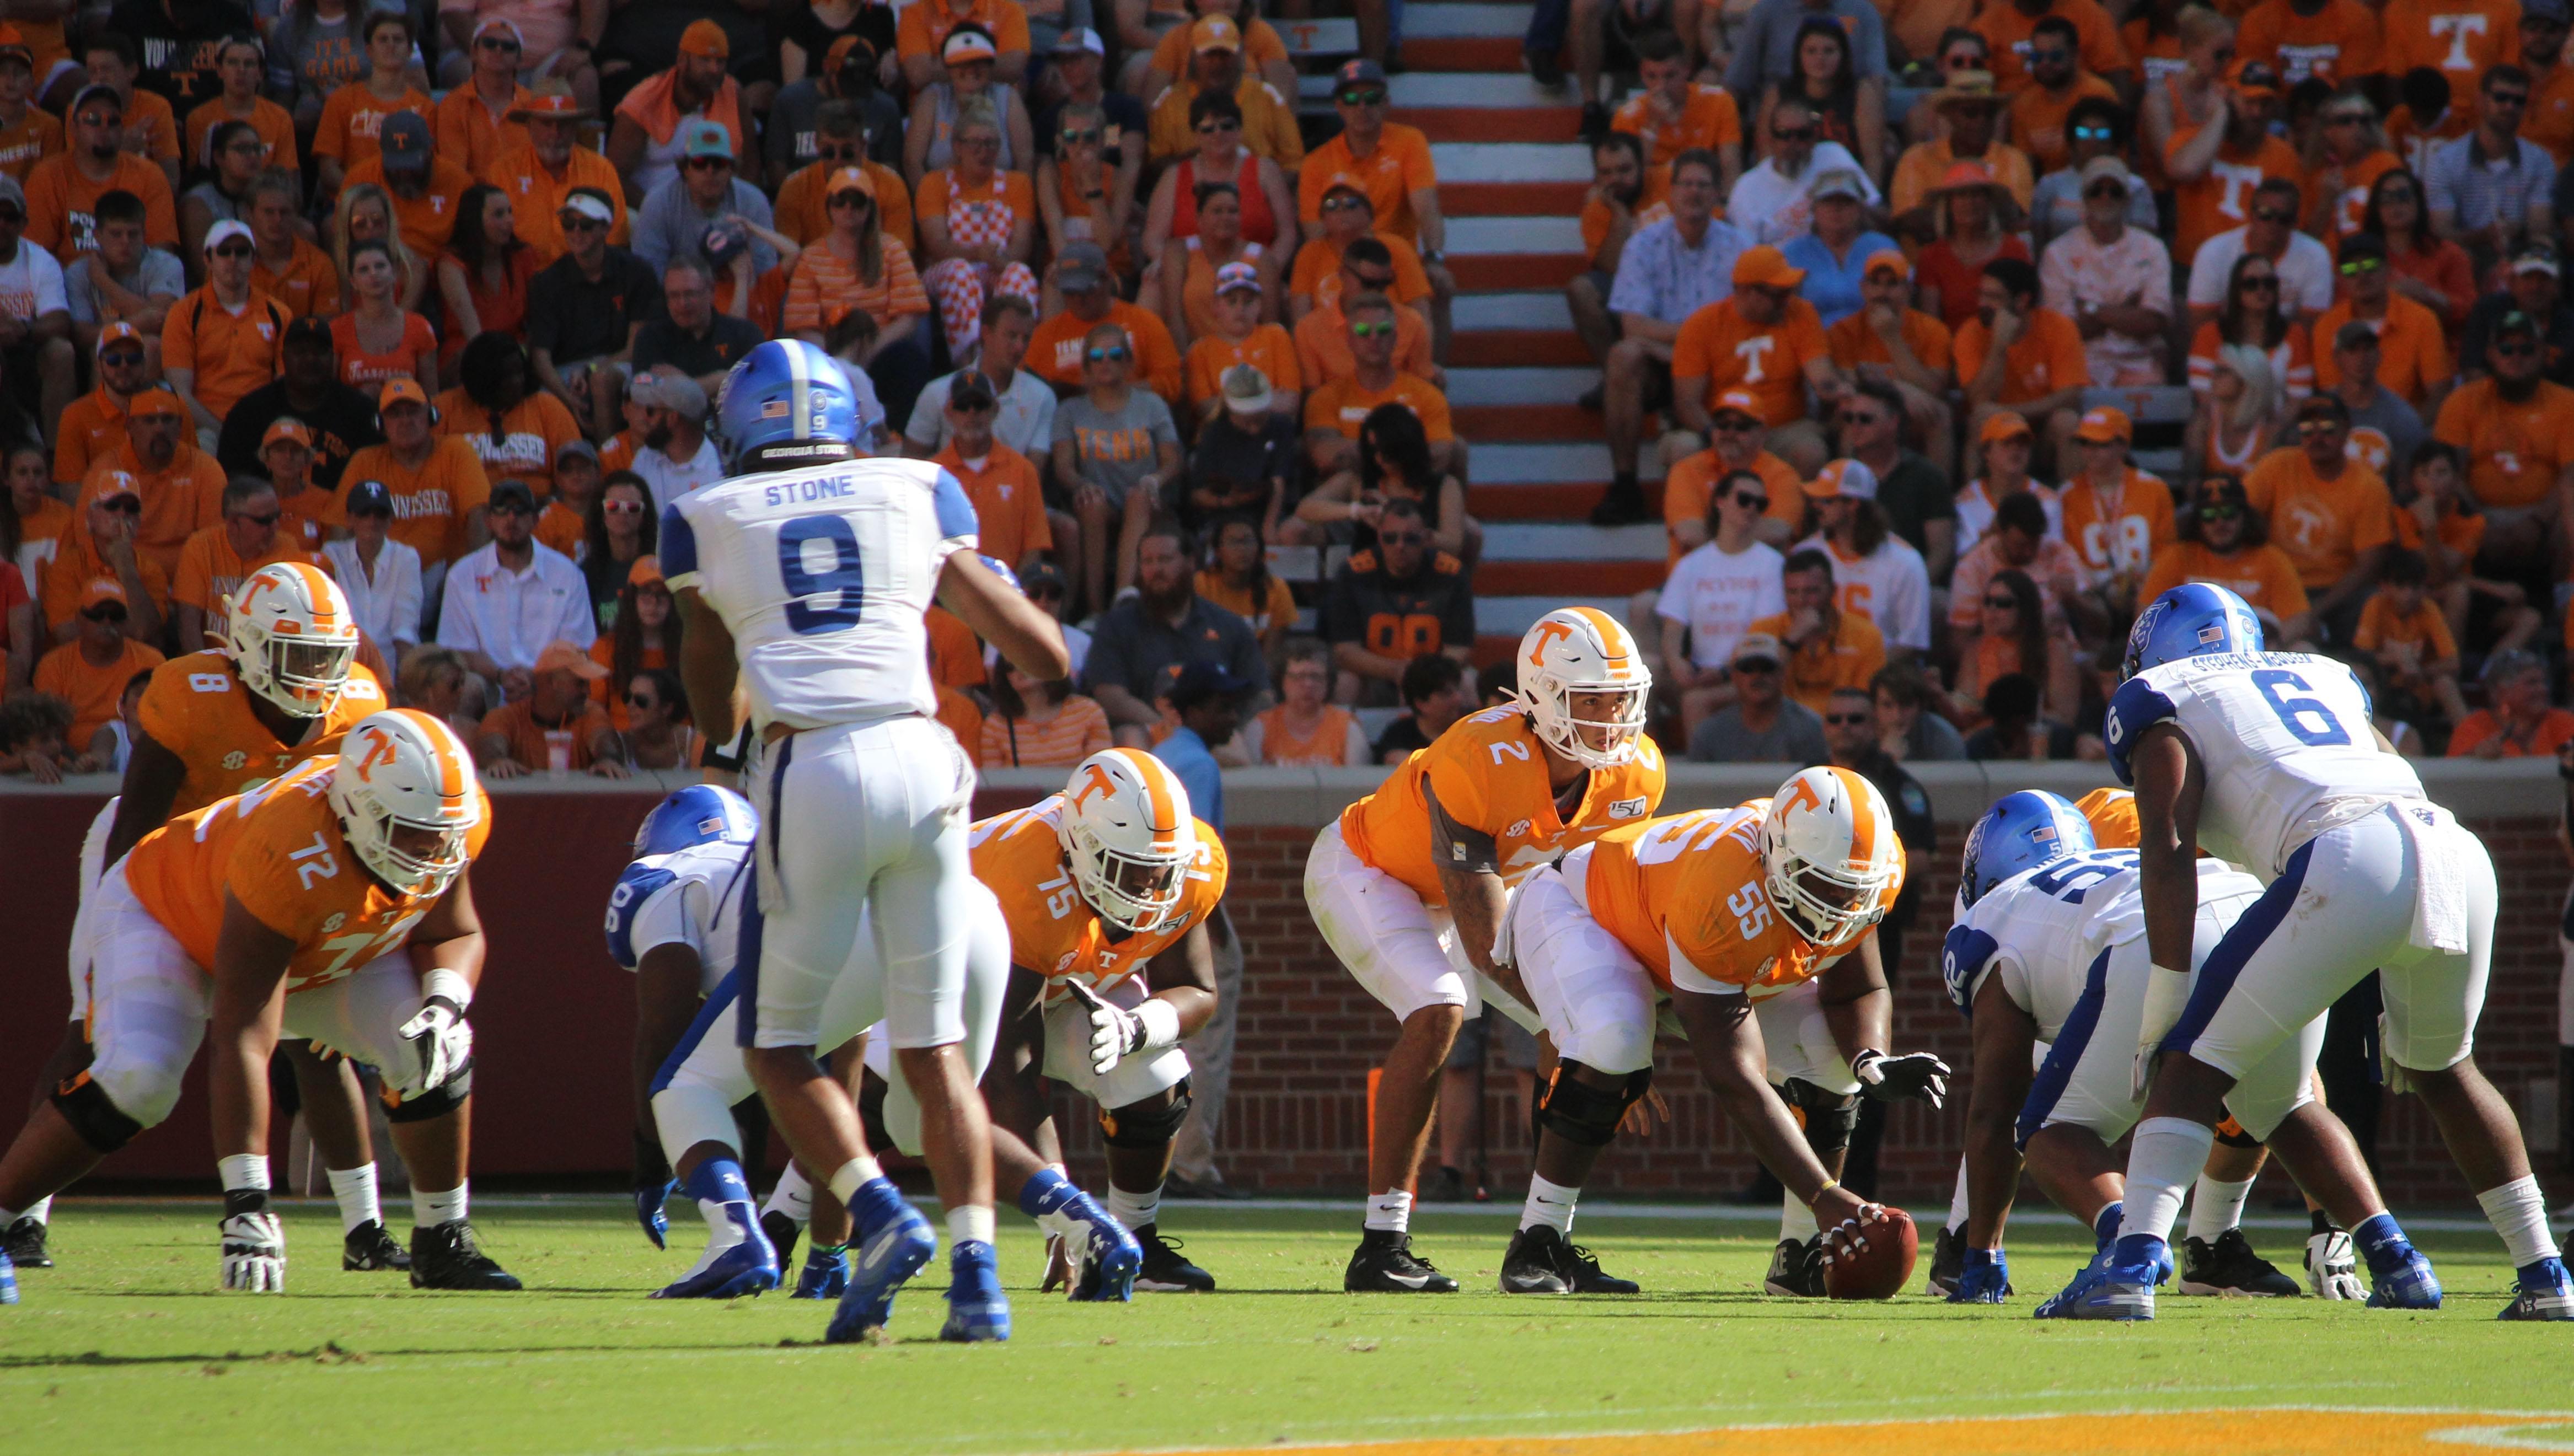 SEC score predictions including Vols/BYU, LSU/Texas